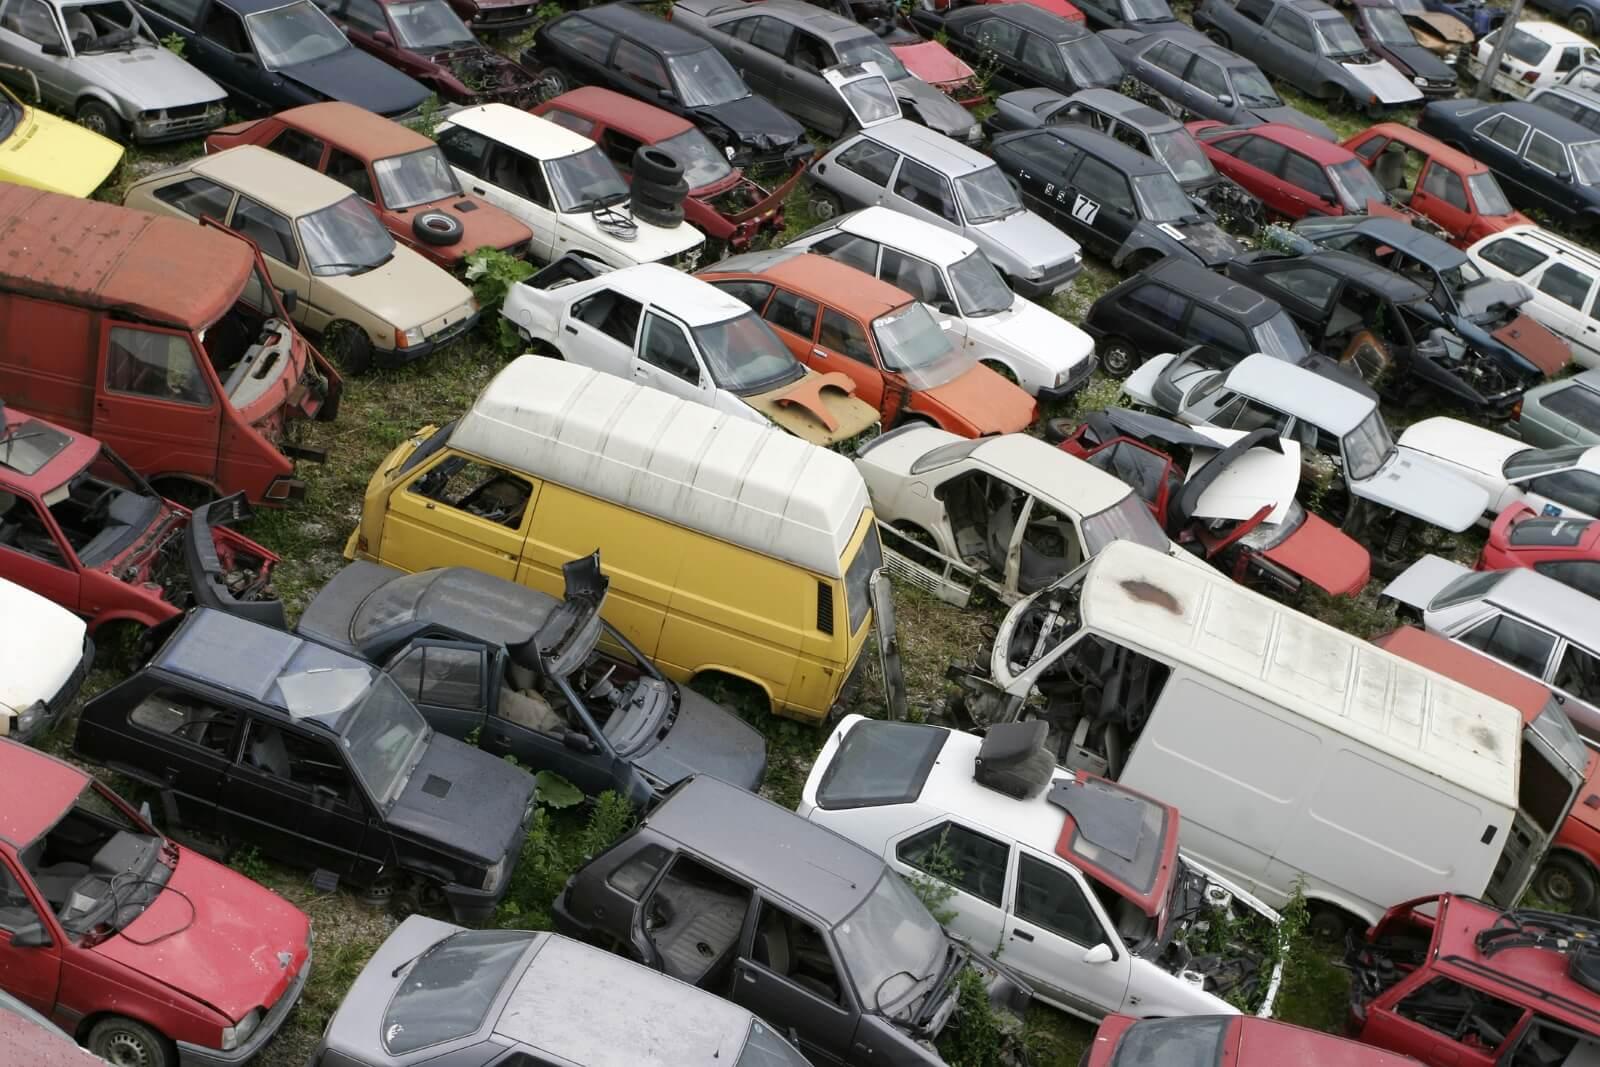 Scrapyard heap of cars